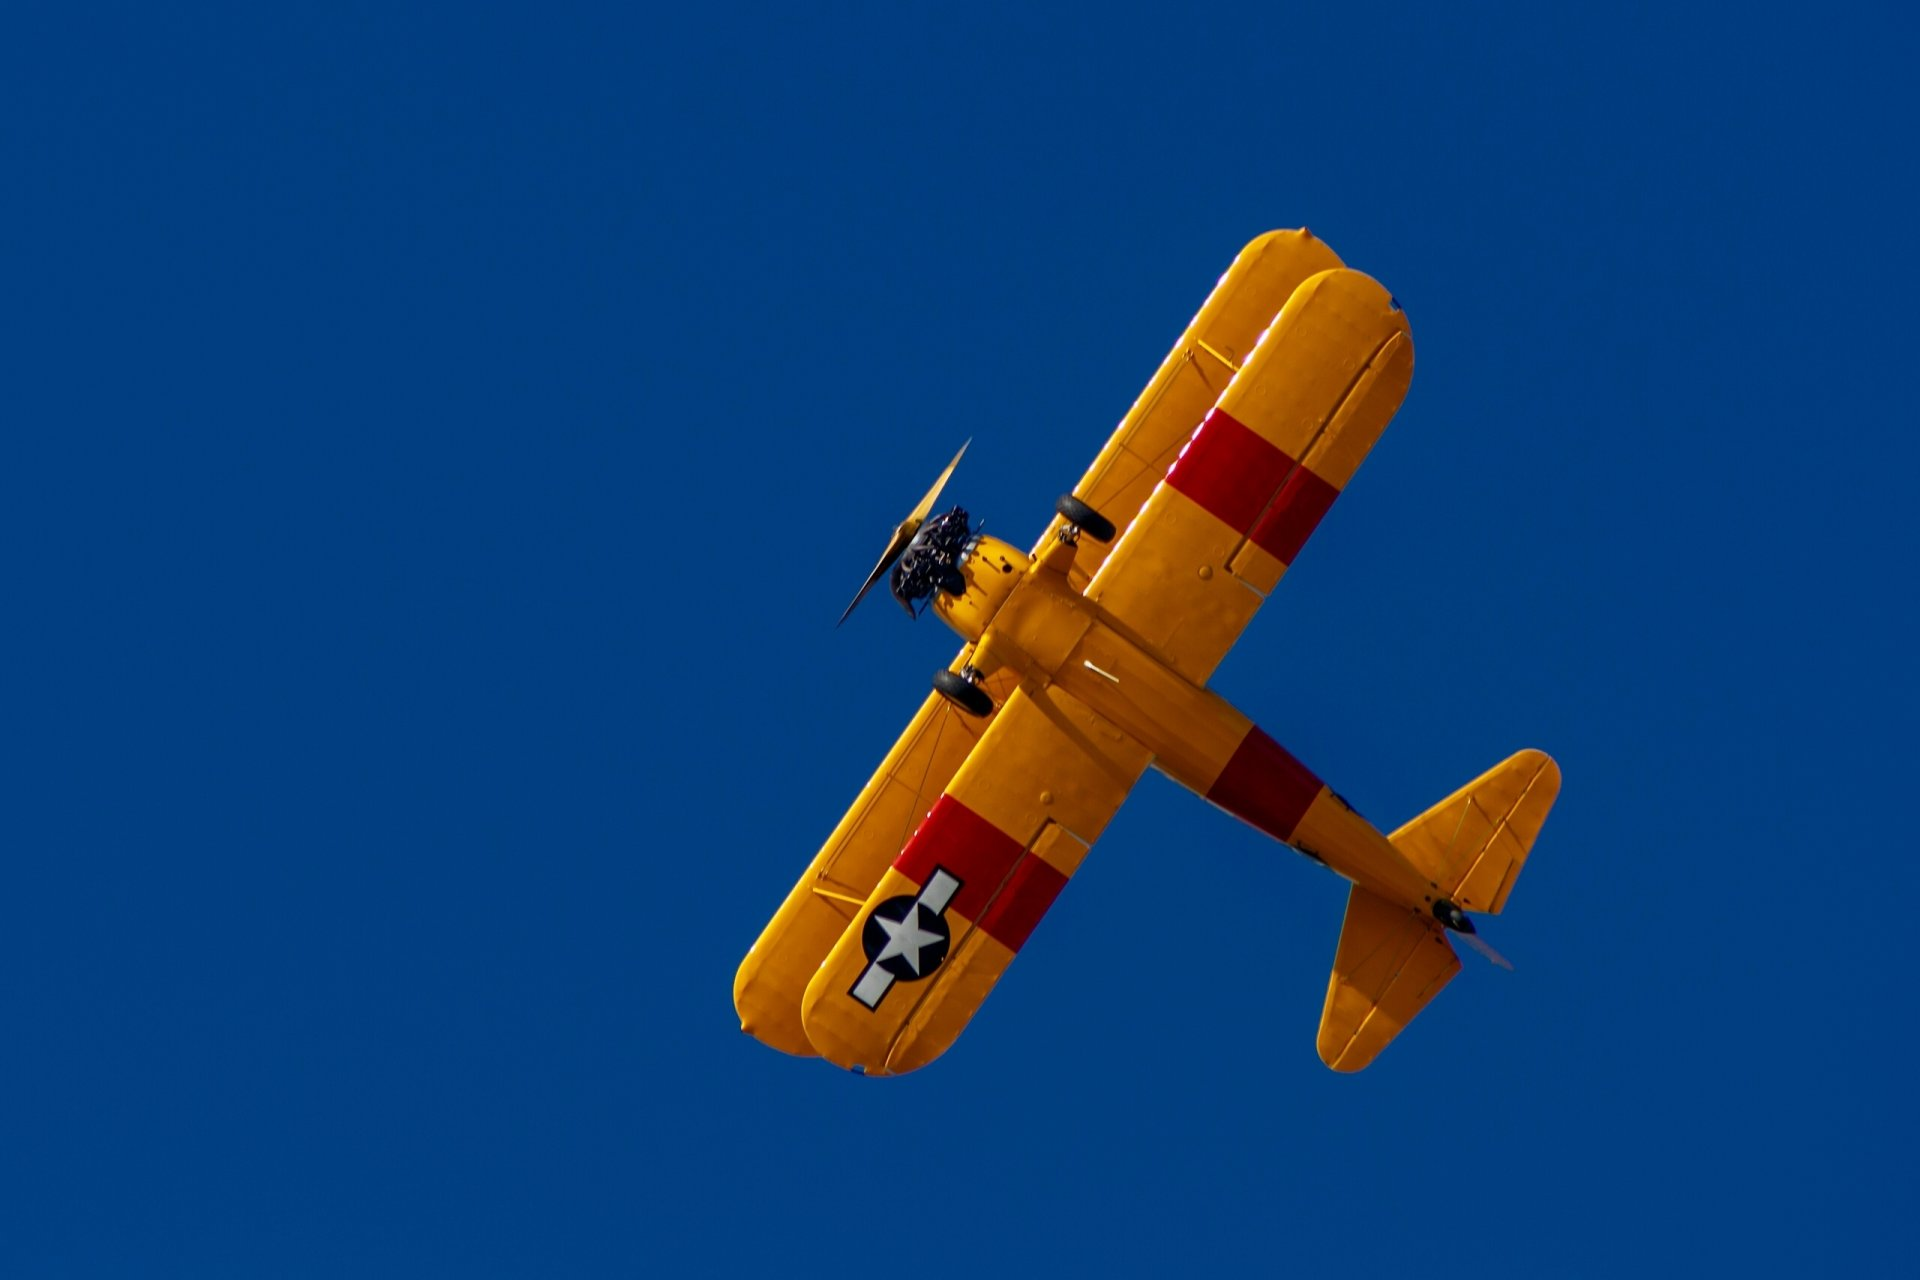 Обои Самолёт, Биплан. Авиация foto 18